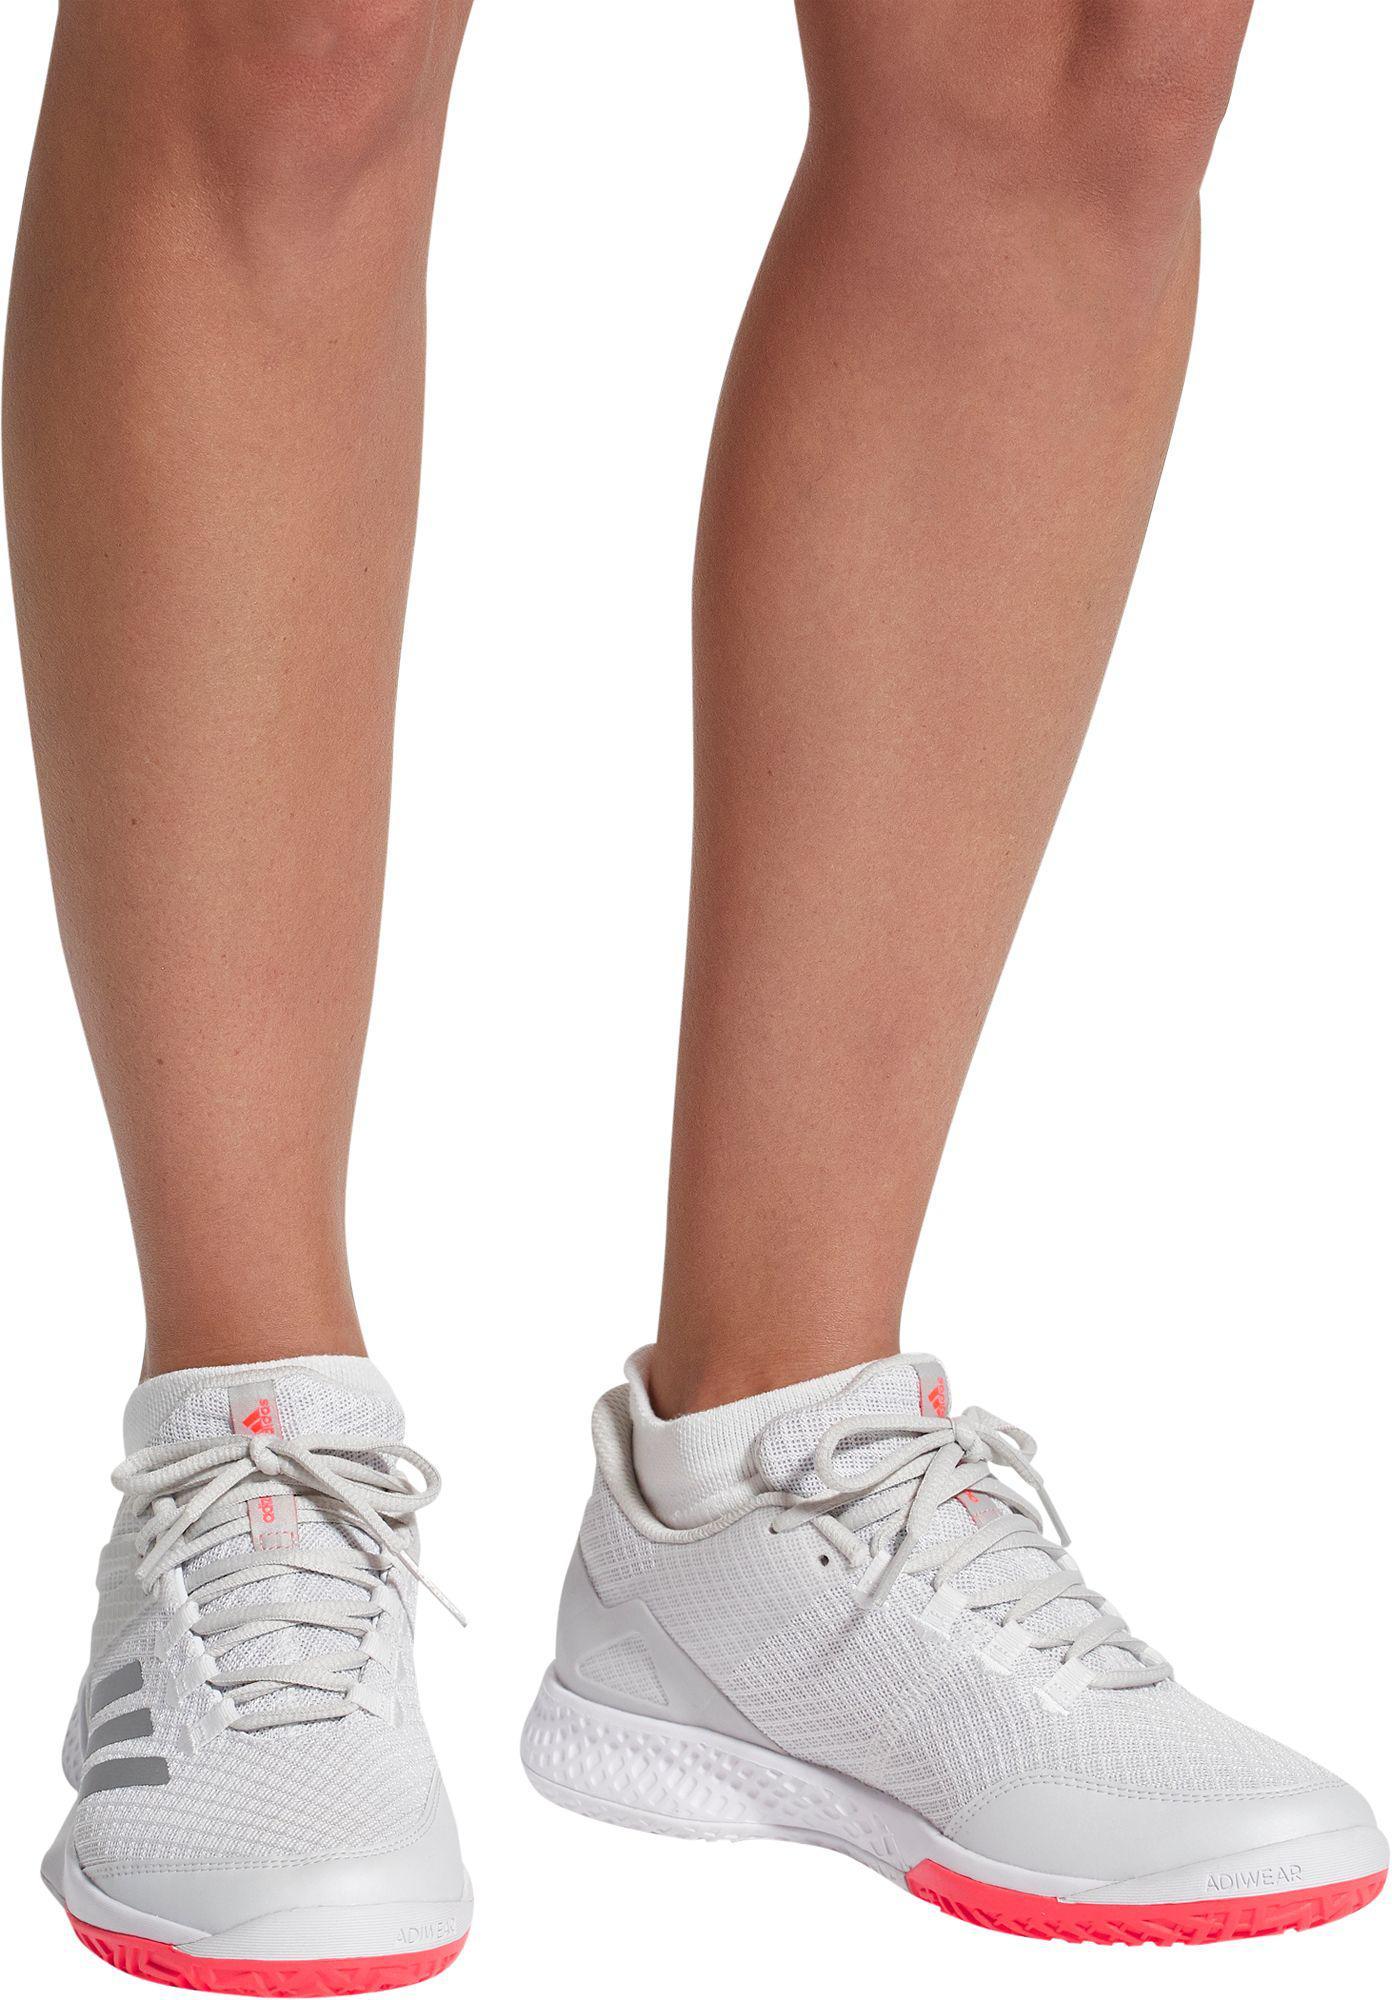 adidas Adizero Club 2 Tennis Shoes in